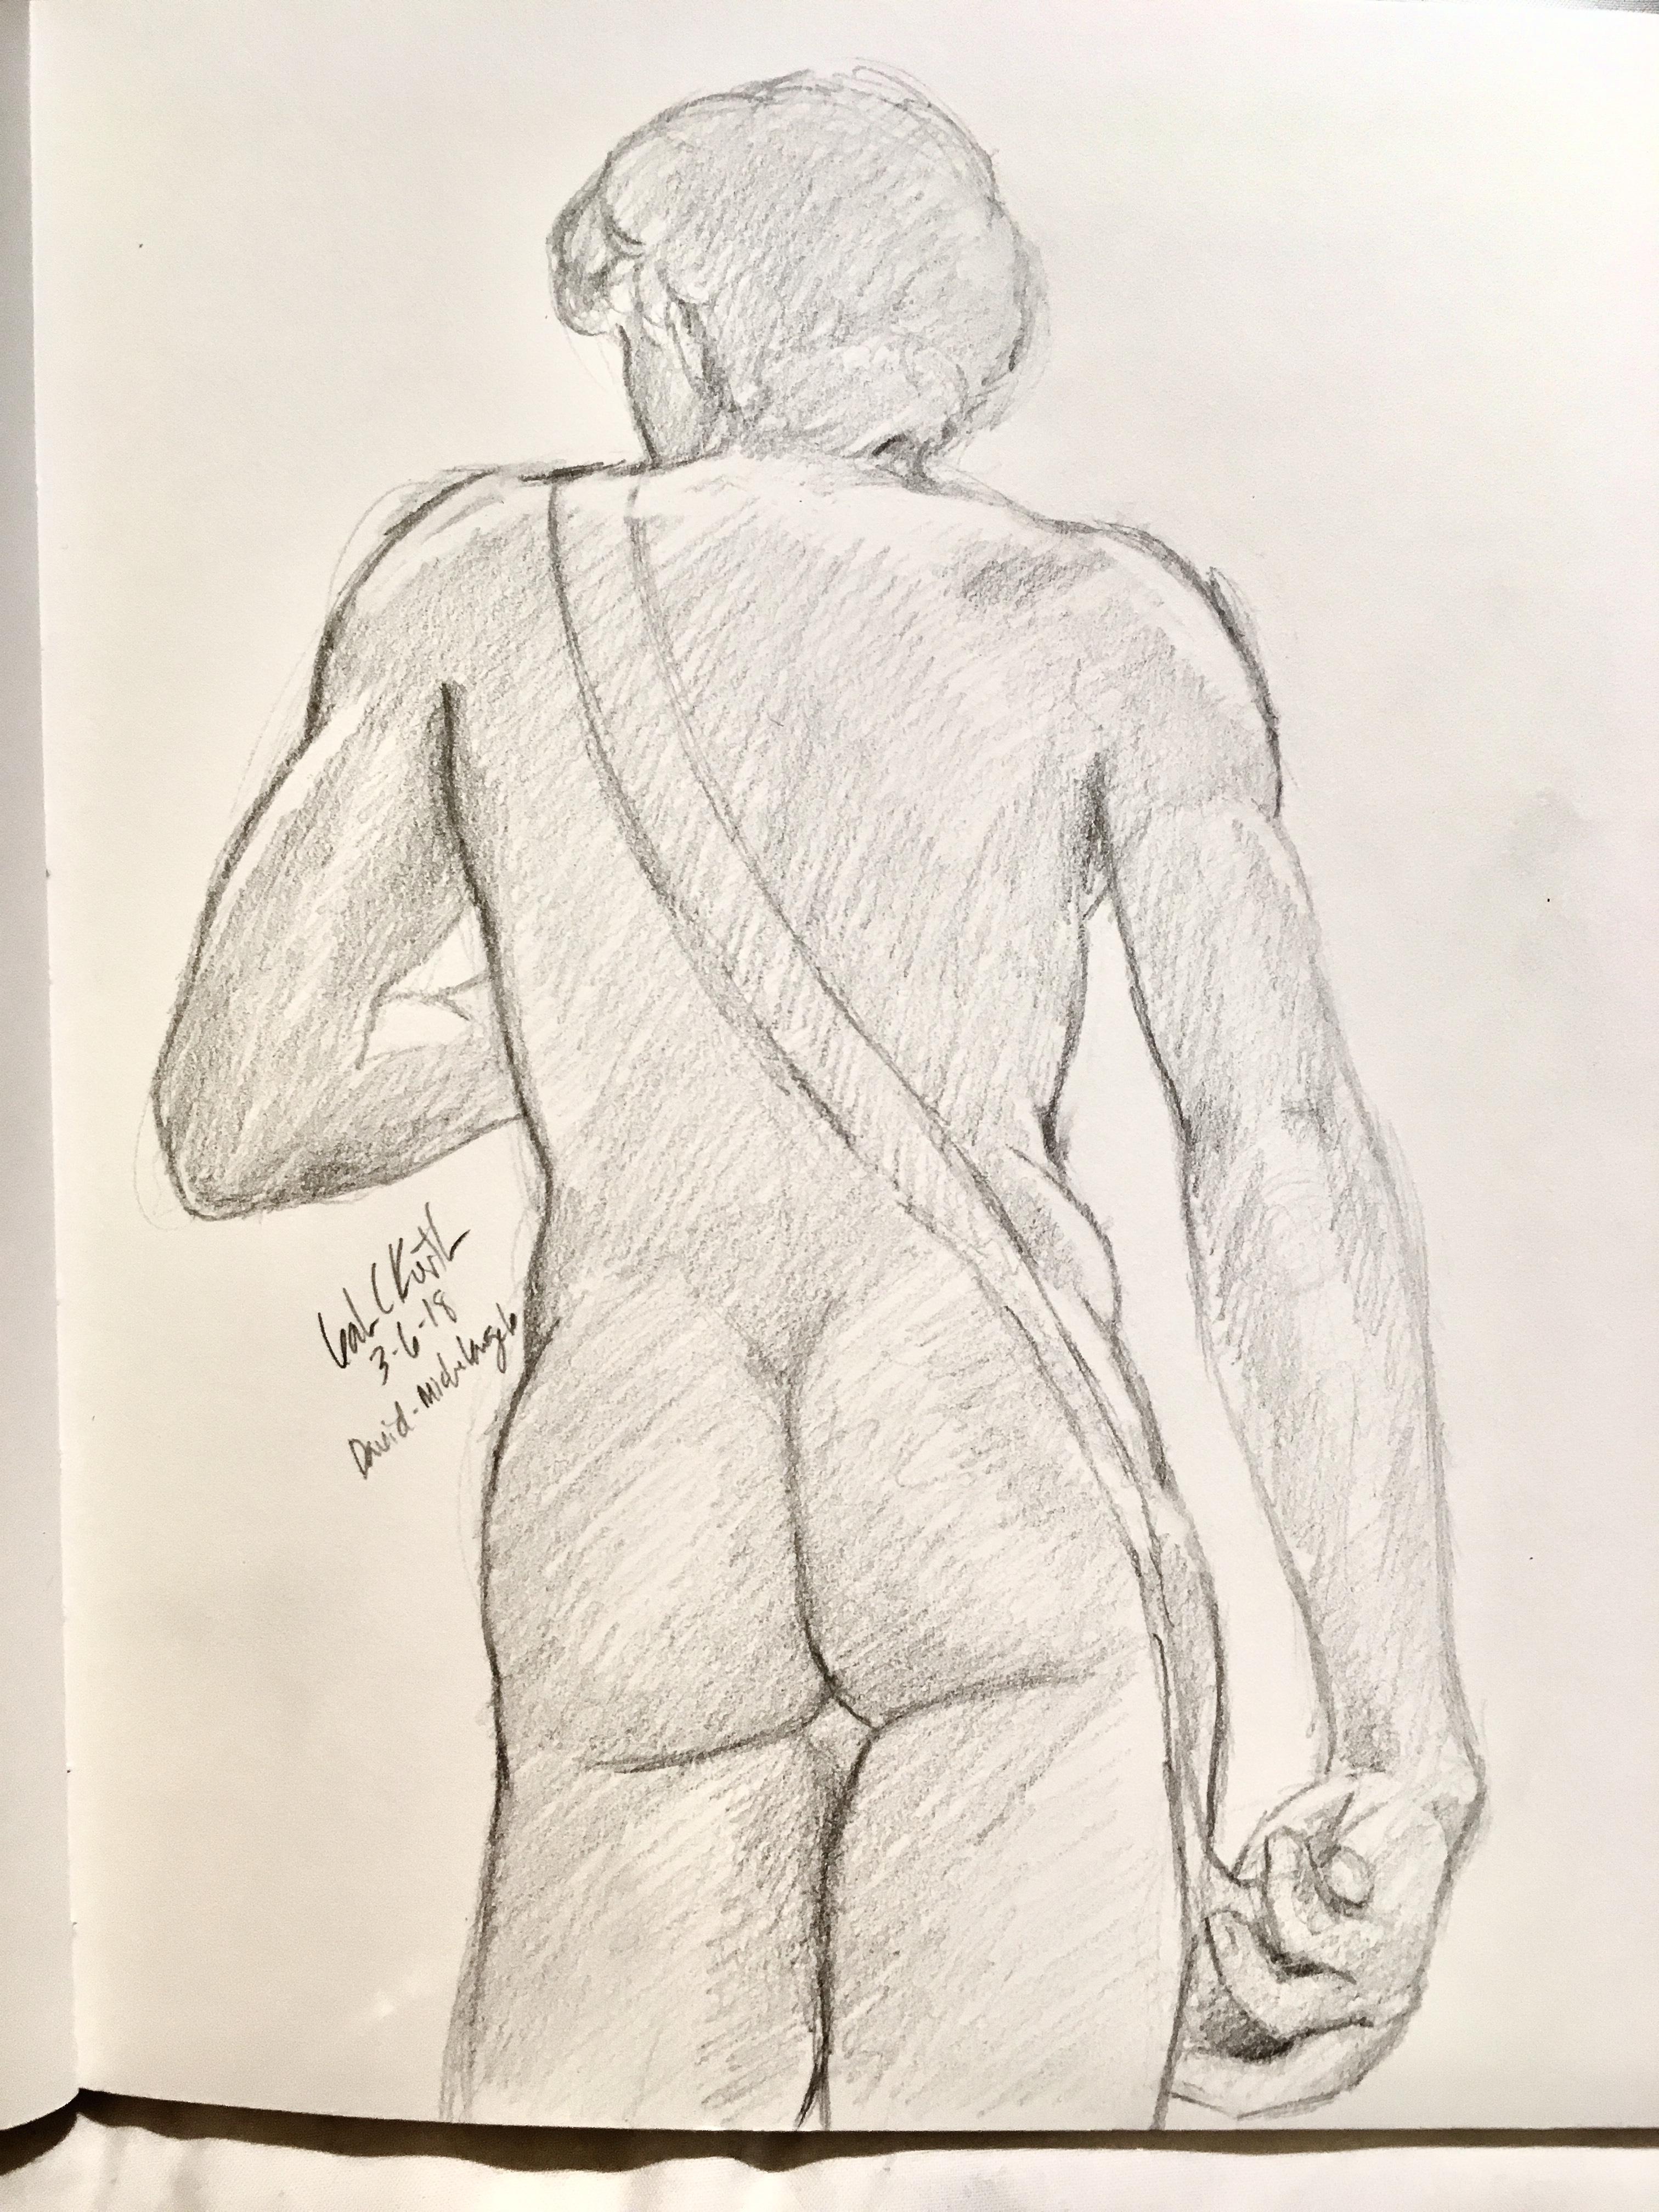 Michelangelo's David from behind